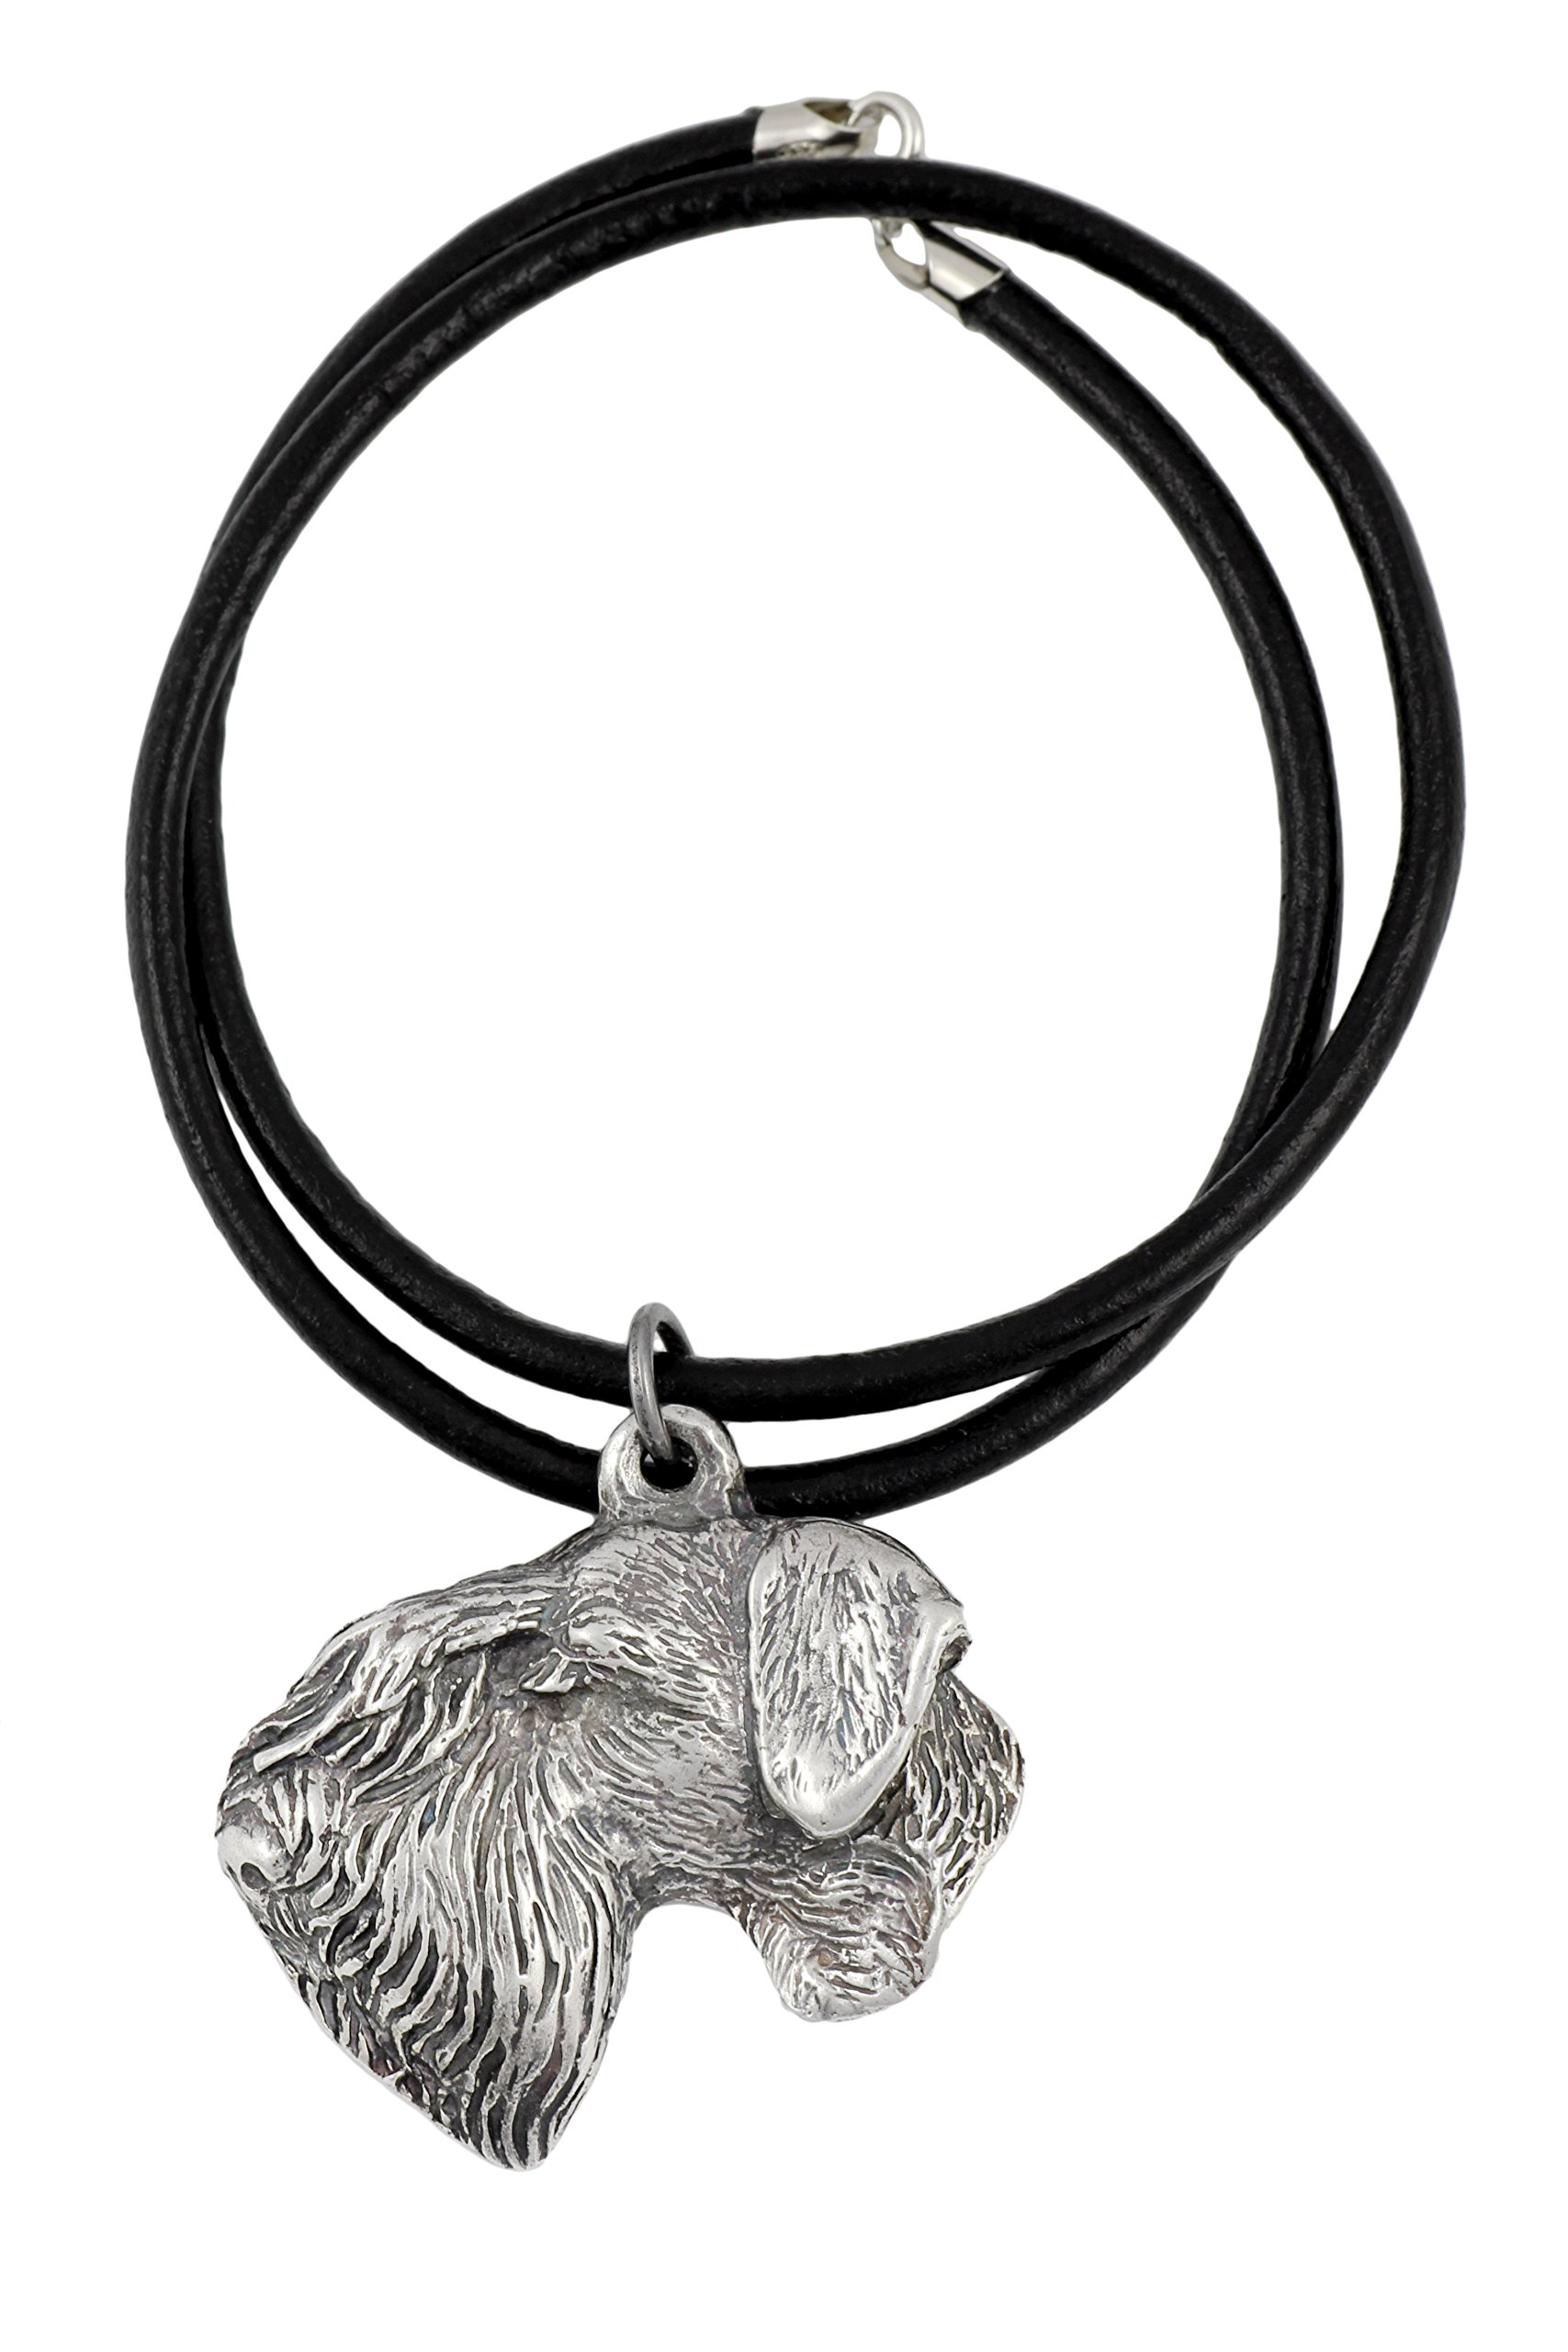 Cesky Terrier, Silver Hallmark 925, Dog Silver Necklaces, Limited Edition, Artdog